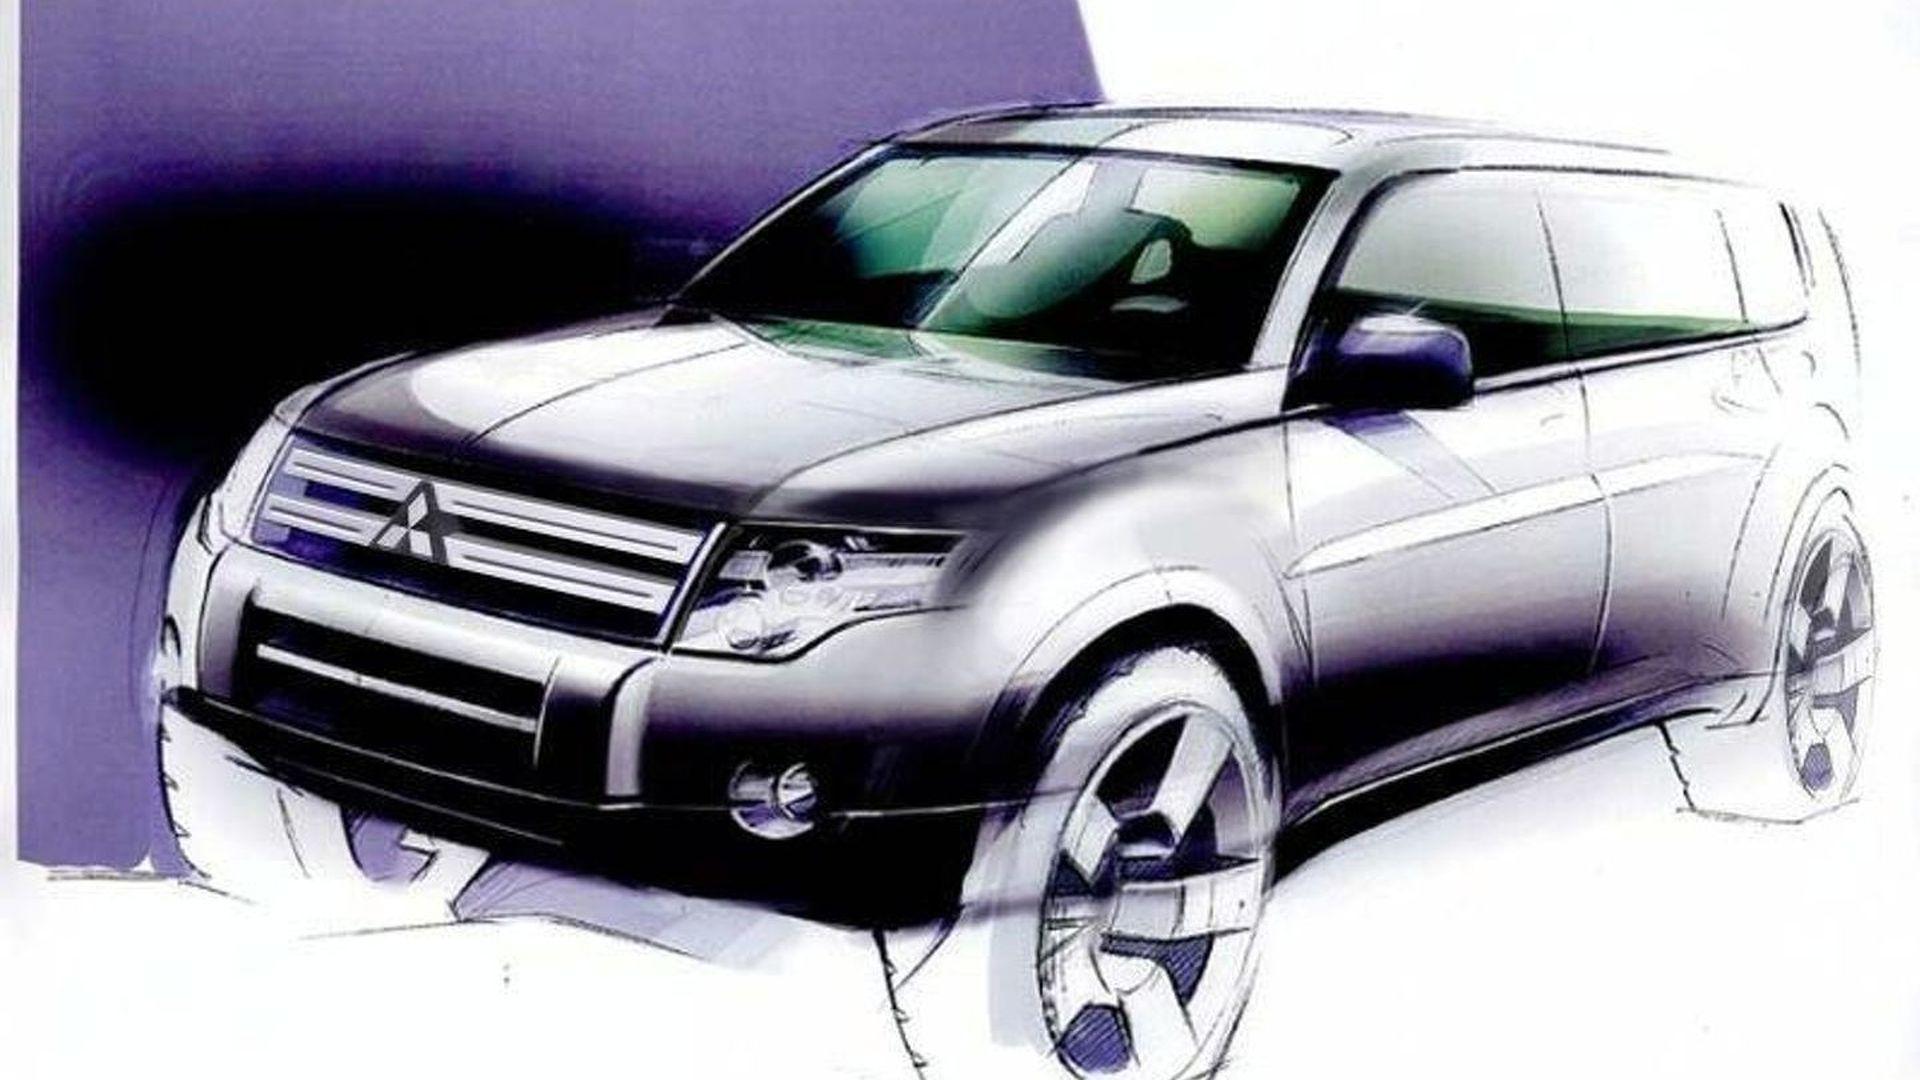 Mitsubishi Pajero / Montero / Shogun replacement delayed - report